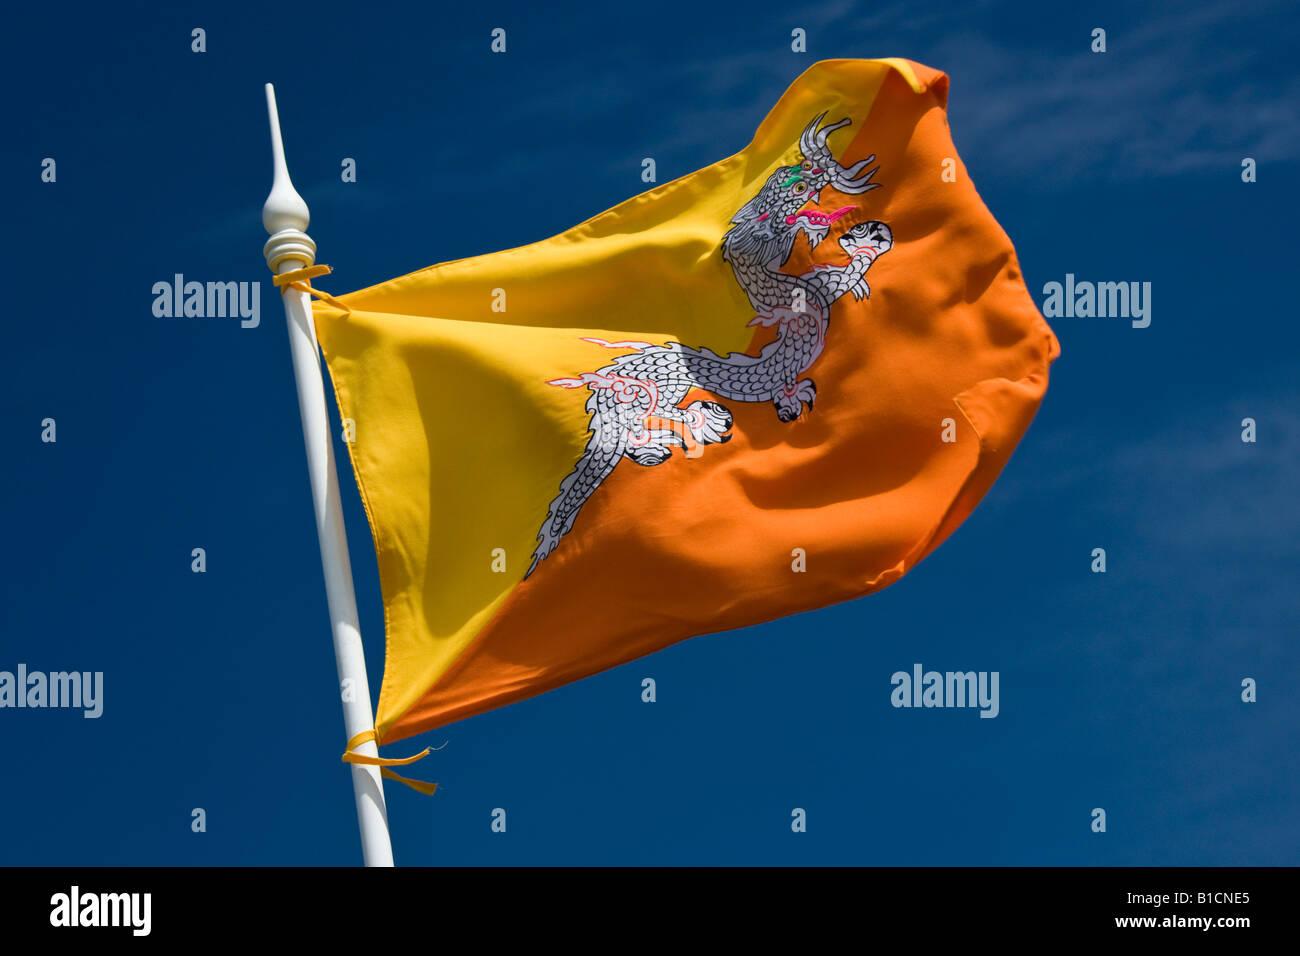 Flag of the Kingdom of Bhutan - Stock Image